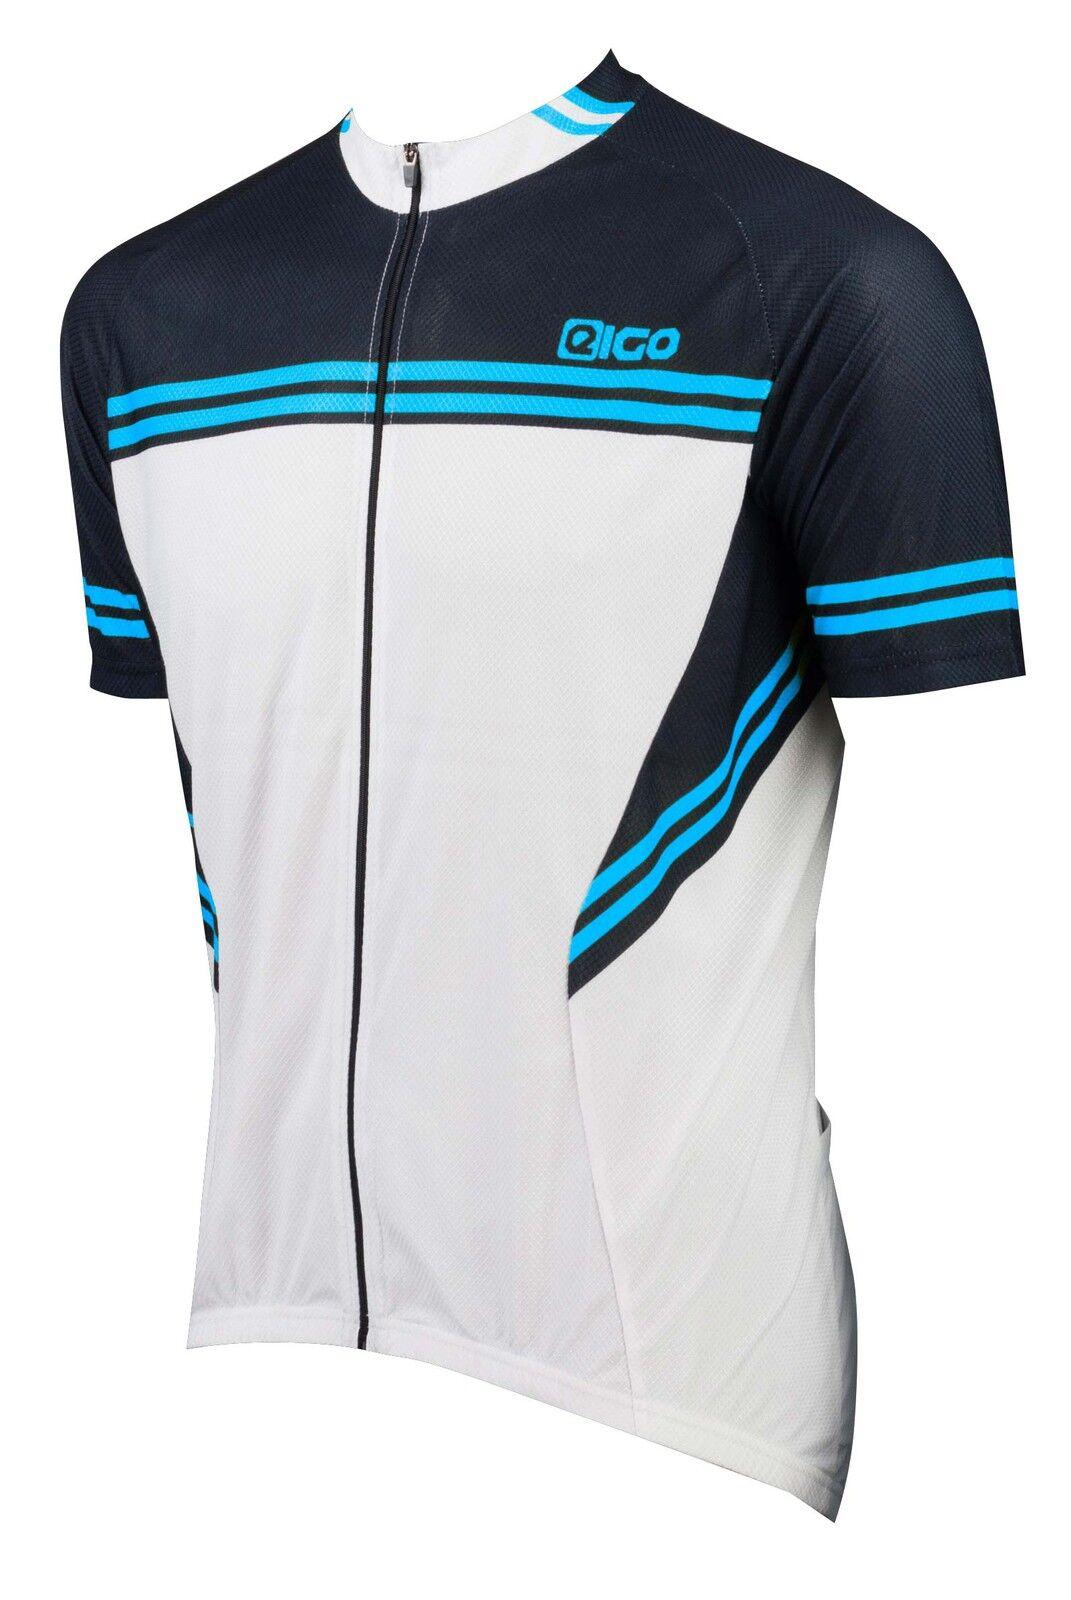 NUOVO Eigo bicicletta strada XC MTB Ciclismo uomoica Corta Jersey Bianco   Nero   Blu